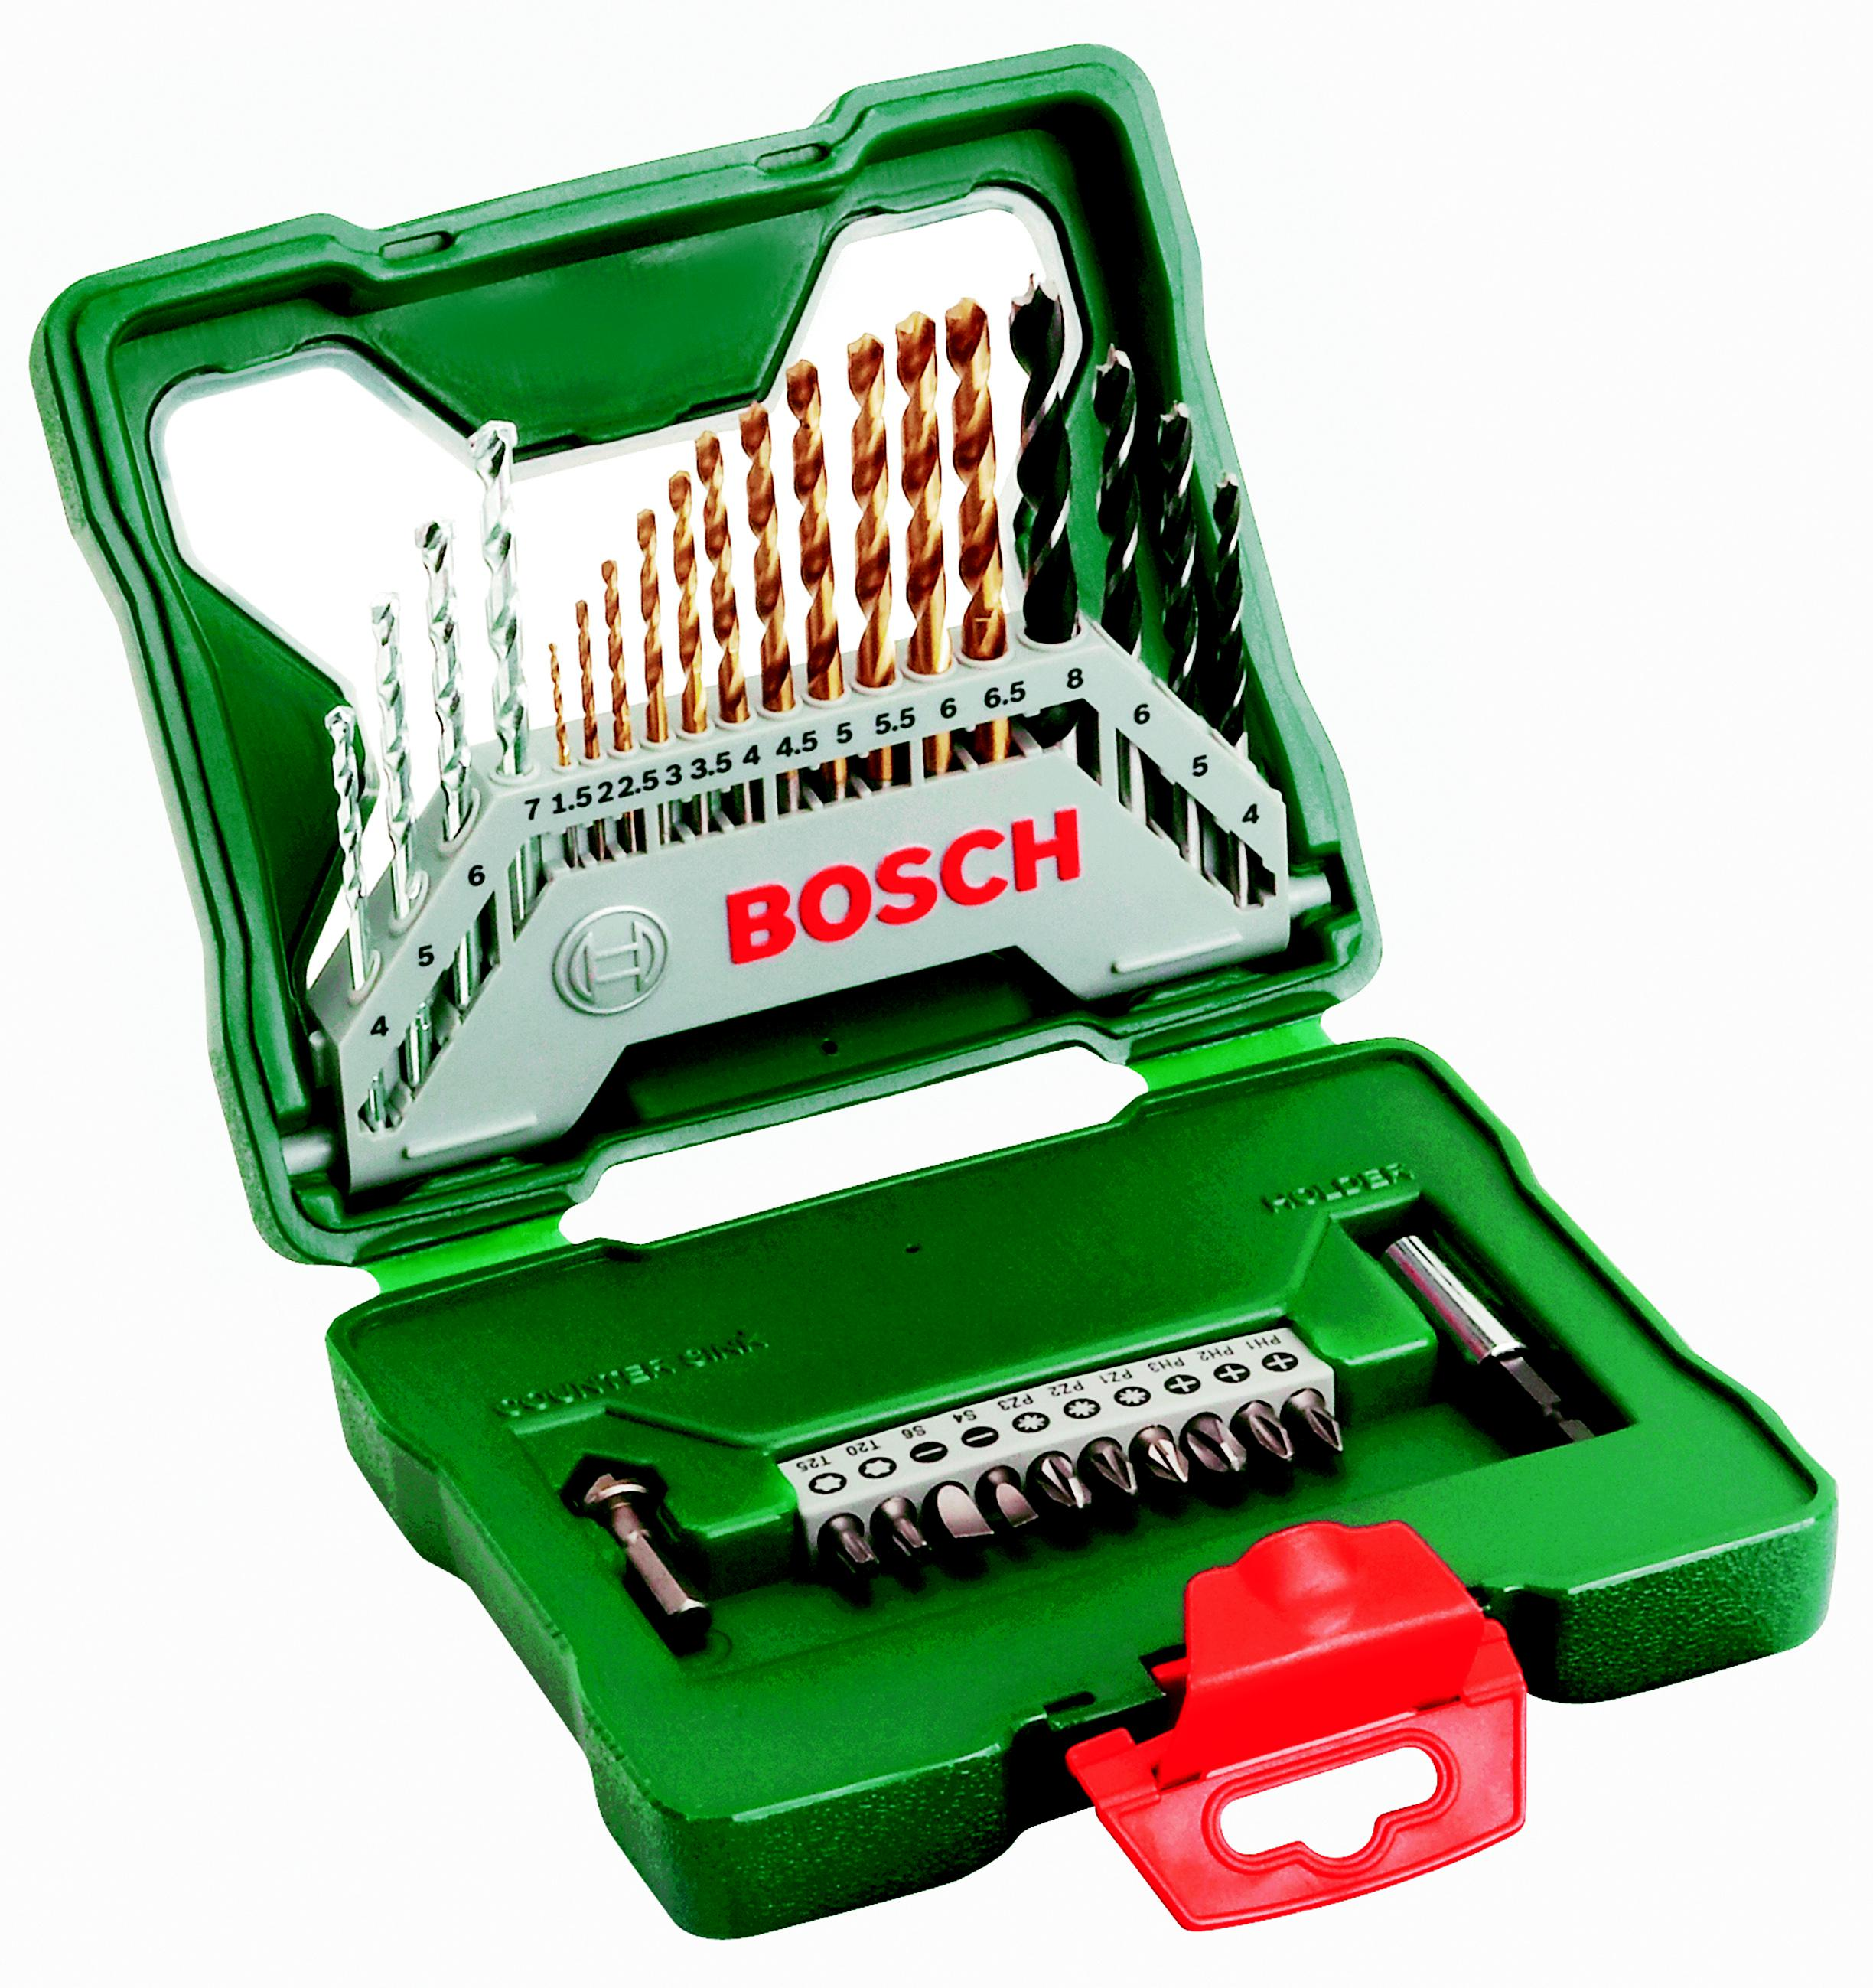 Набор бит и сверл Bosch X-line 30 titanium (2.607.019.324) набор инструмента bosch x line 103 2607019331